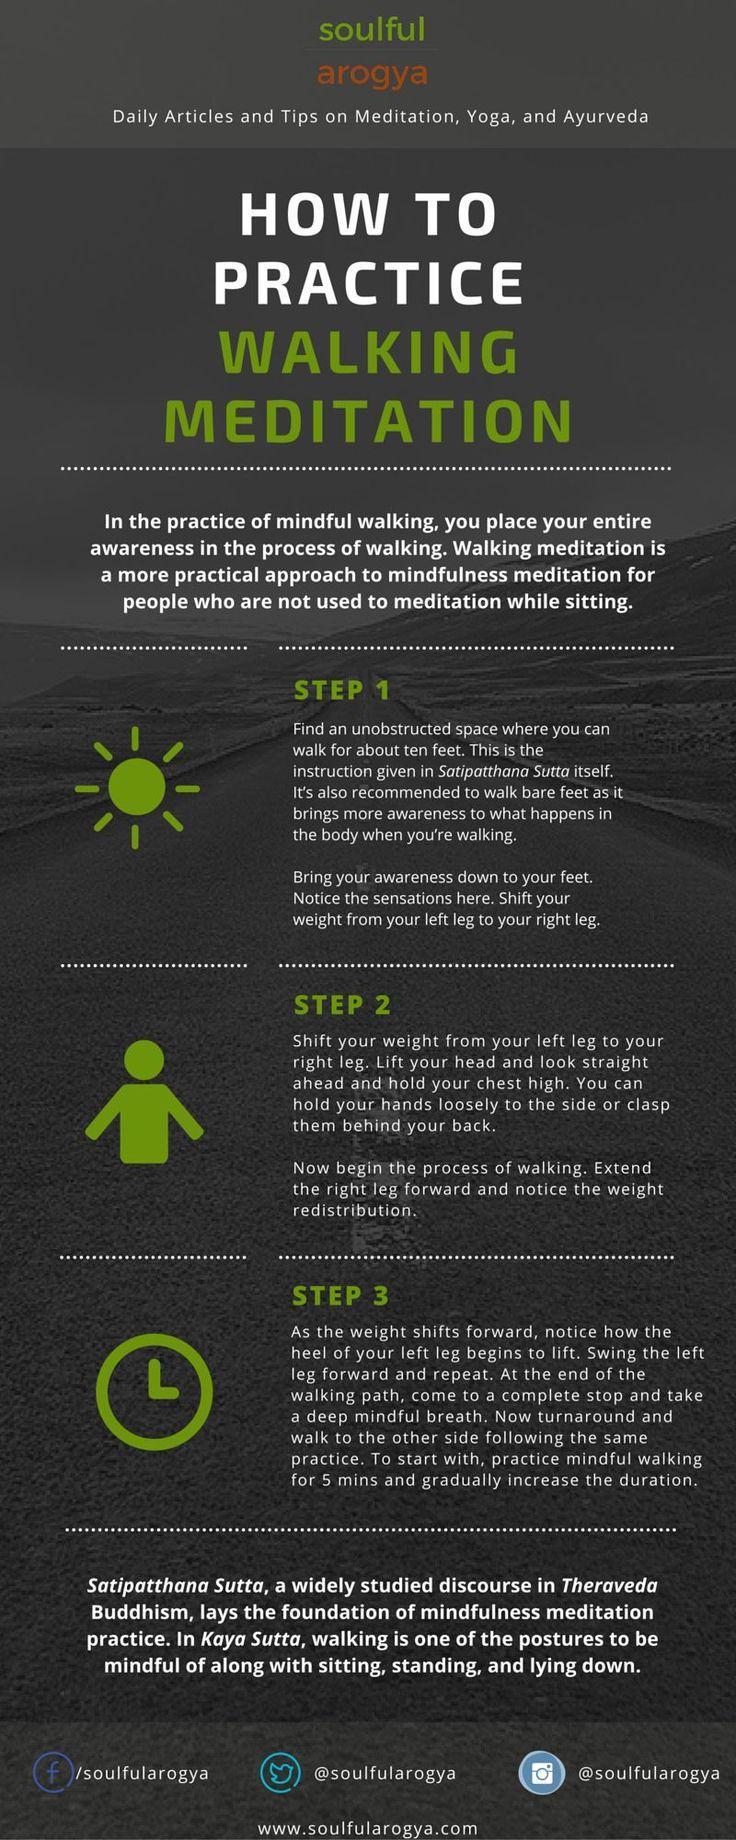 How to Practice Walking Meditation! #meditation #walking